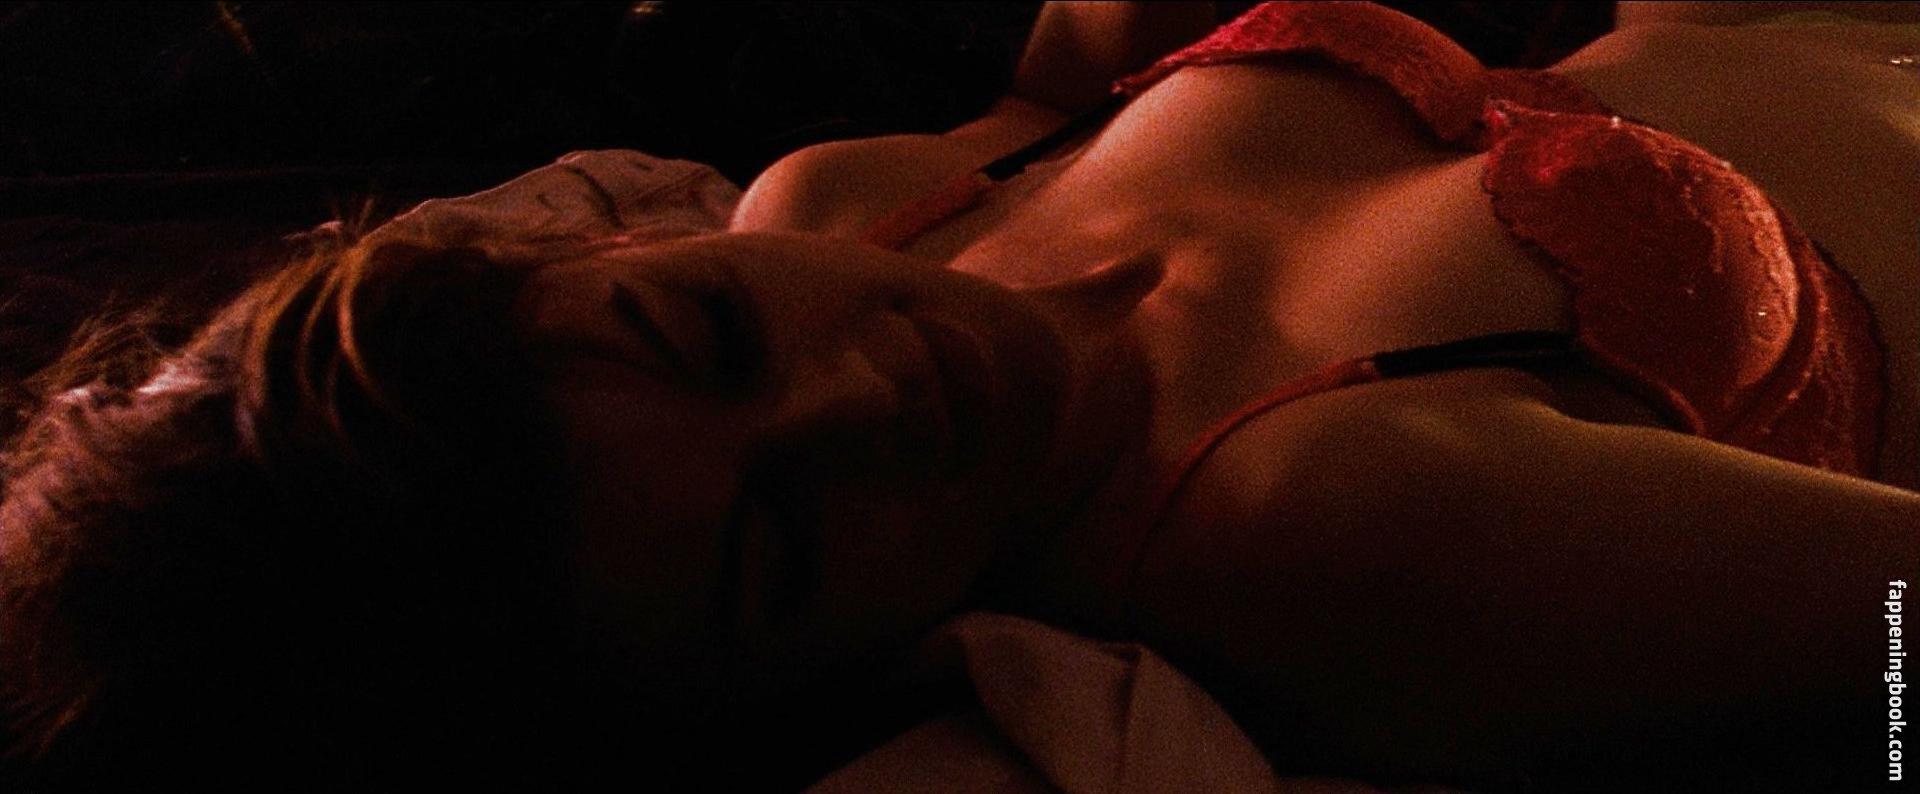 The Fapppening Carol Potter (actress) naked (54 fotos) Paparazzi, iCloud, cameltoe